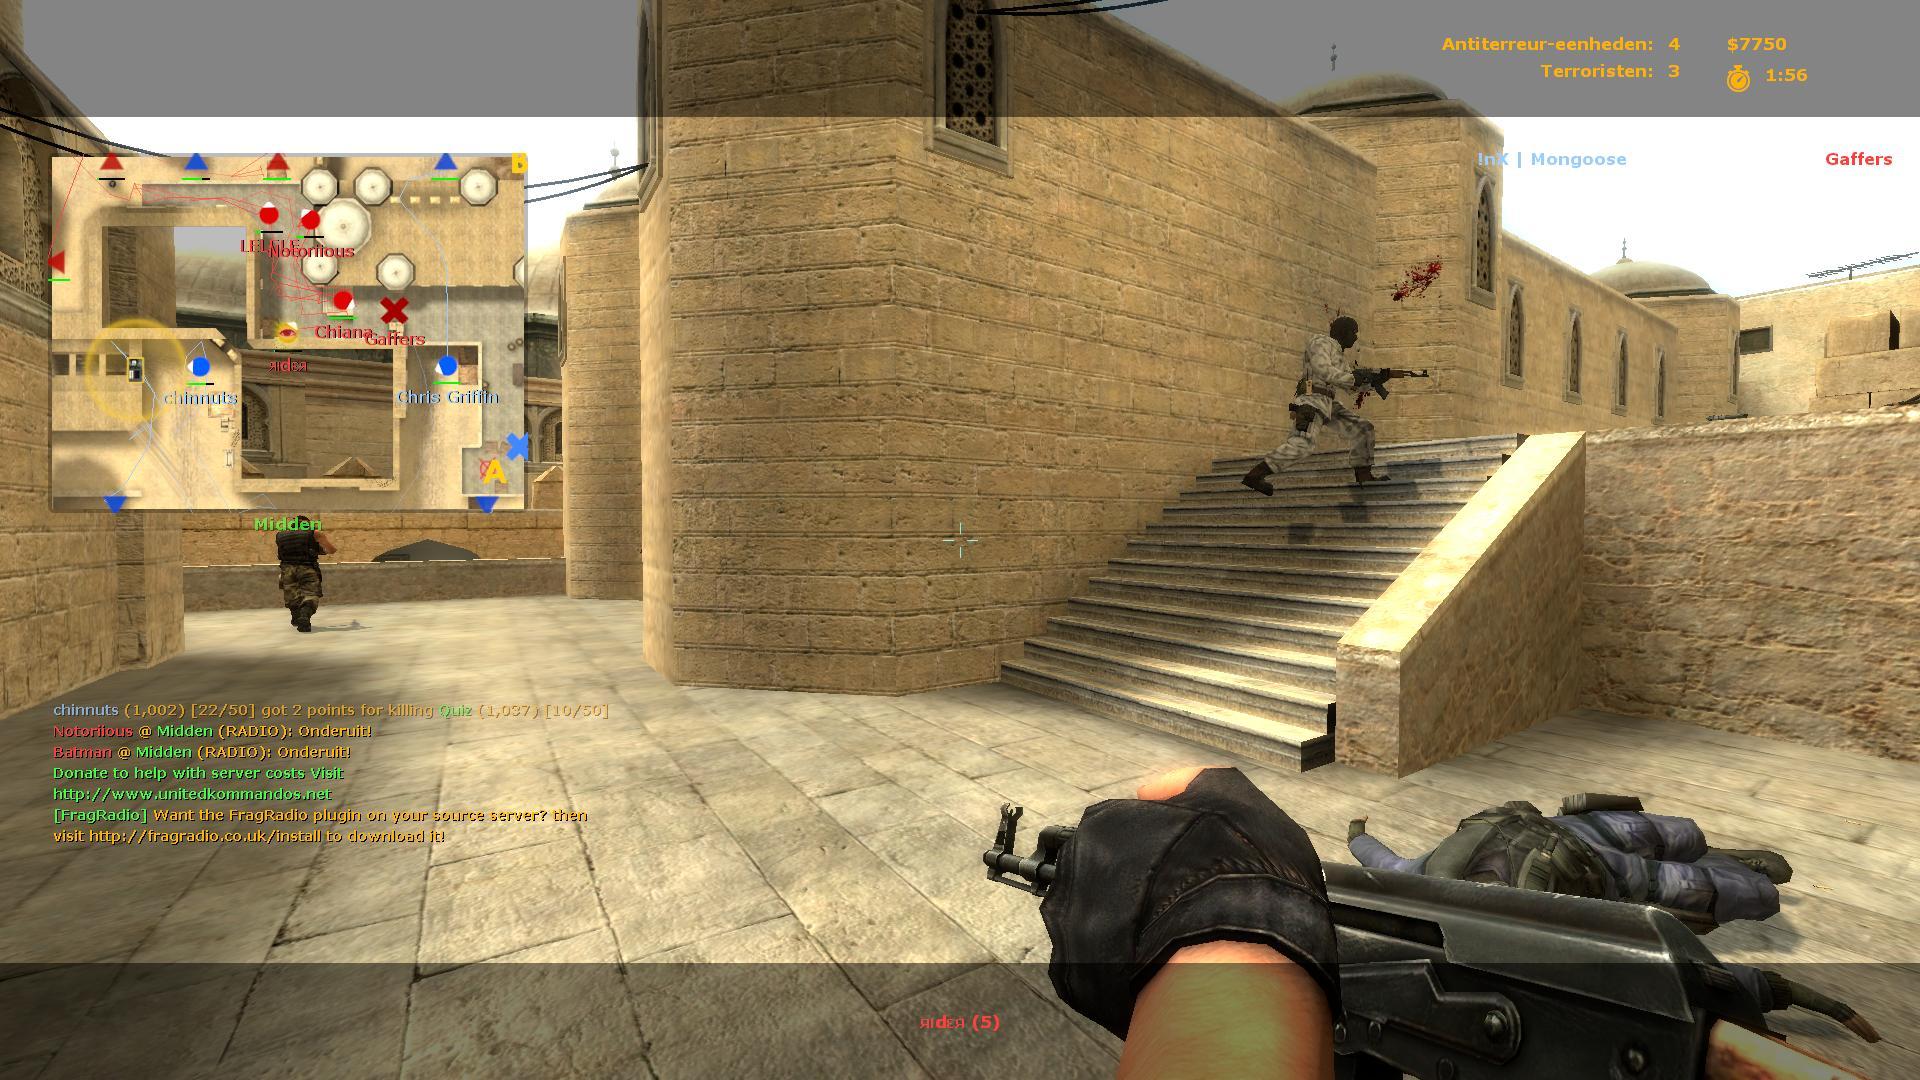 Counter strike Source Half Life 2 css screenshot - Gamingcfg com